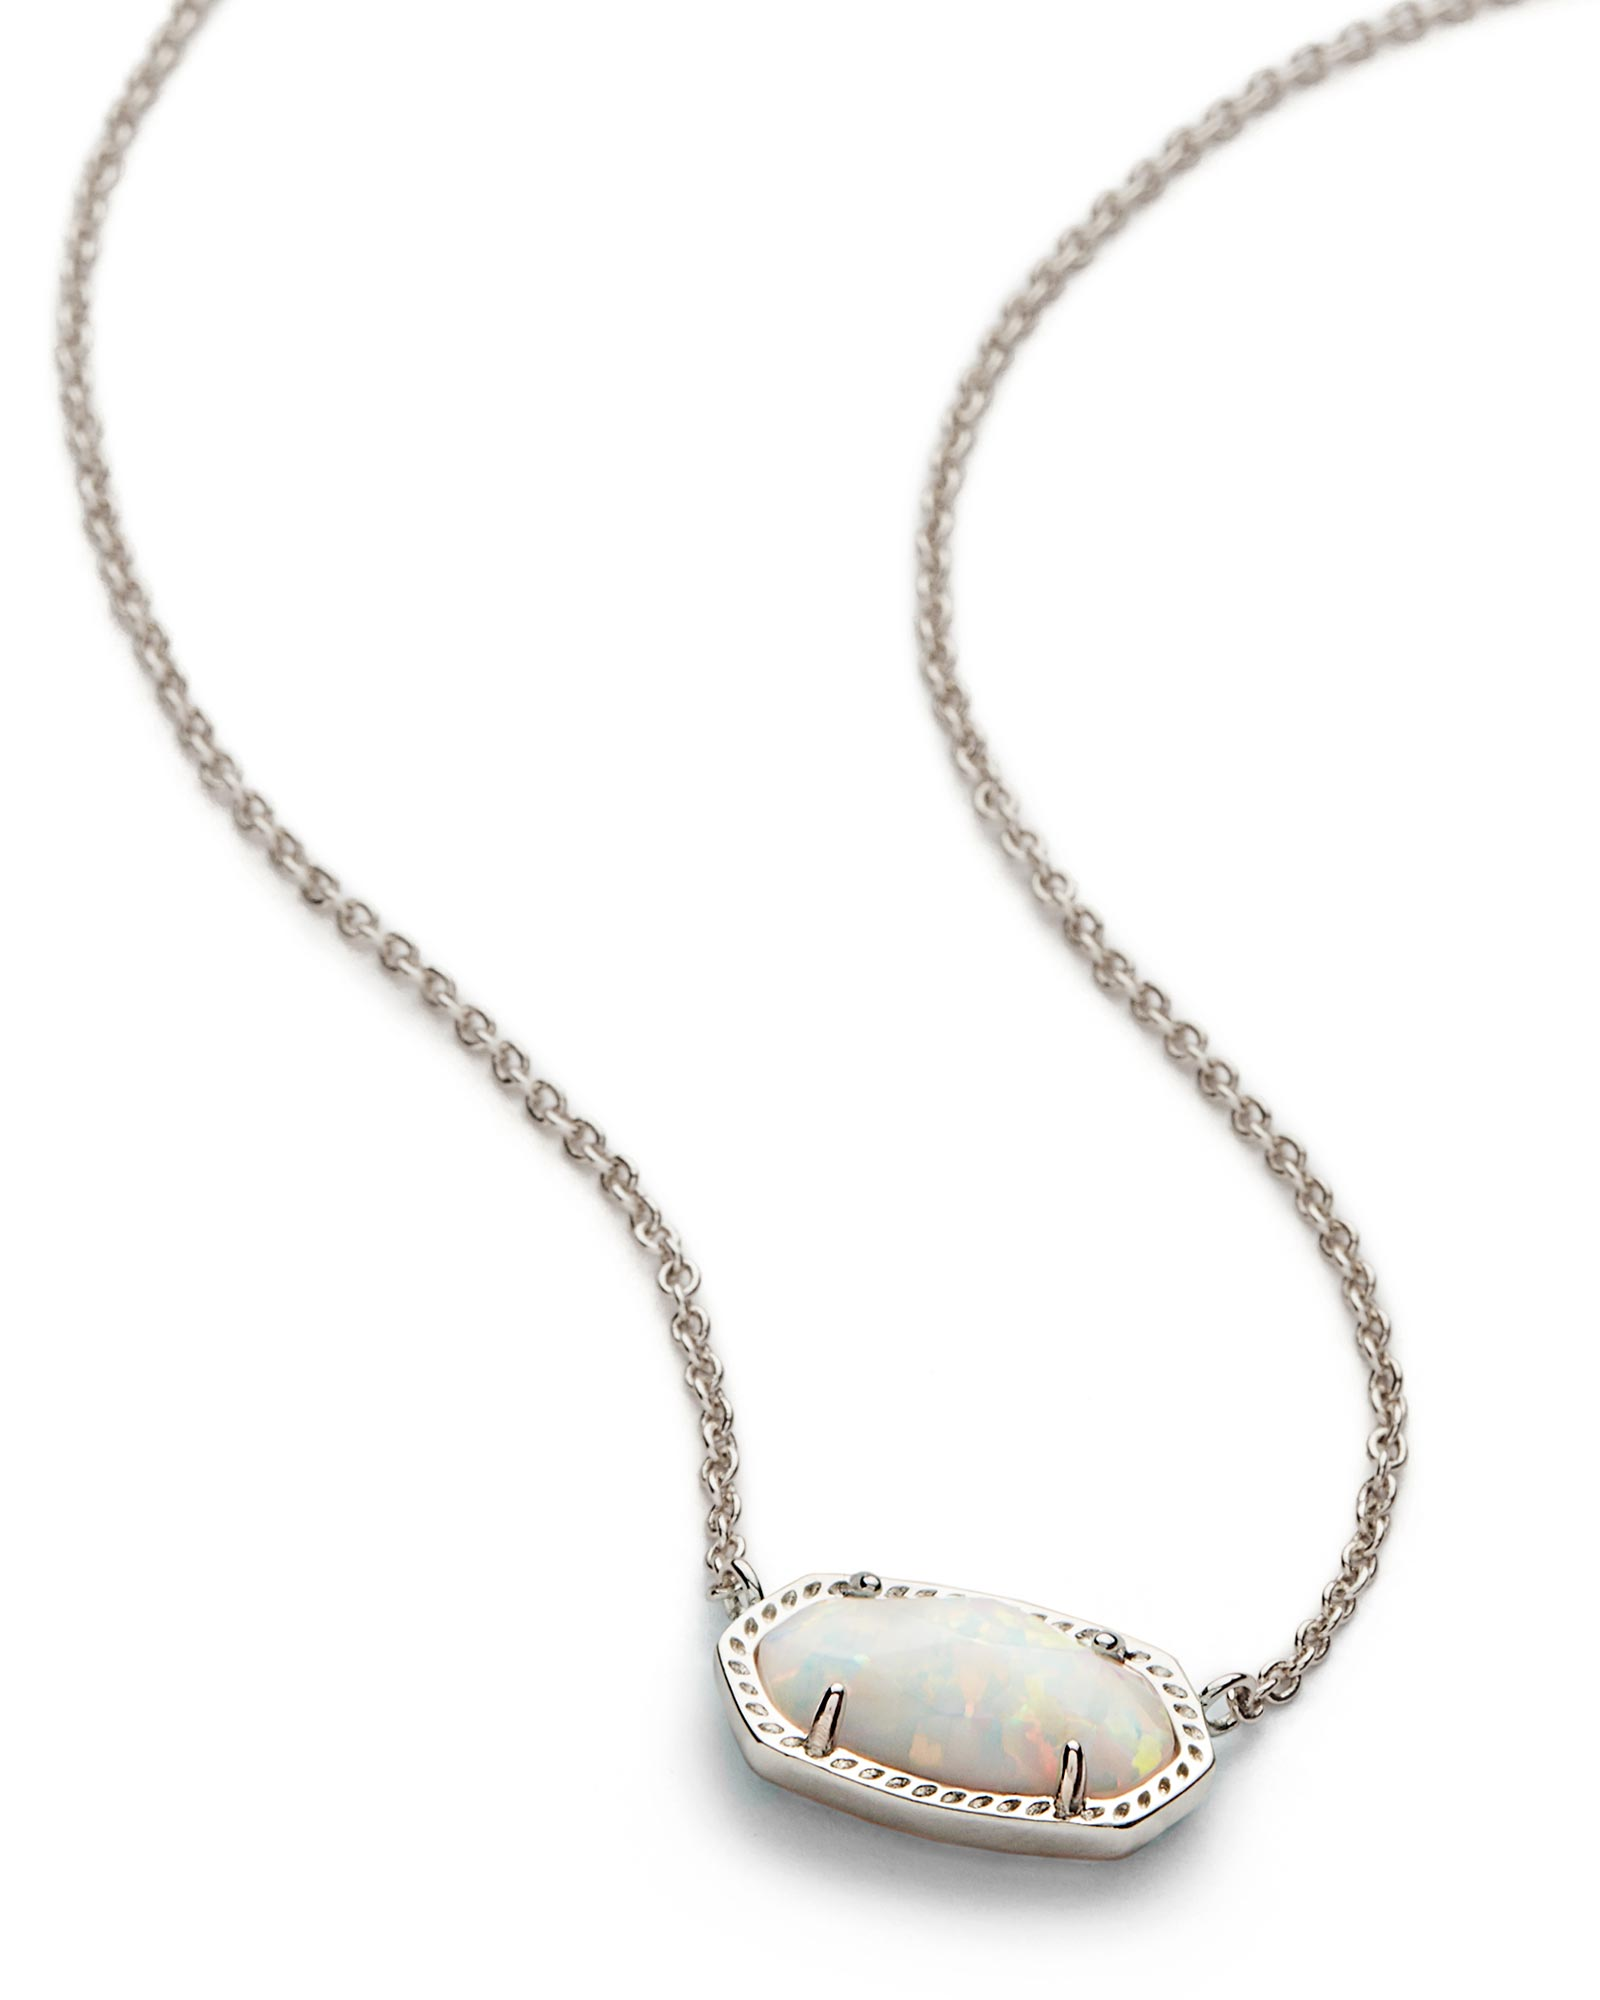 Elisa silver pendant necklace in white opal kendra scott elisa silver pendant necklace in white kyocera opal aloadofball Images